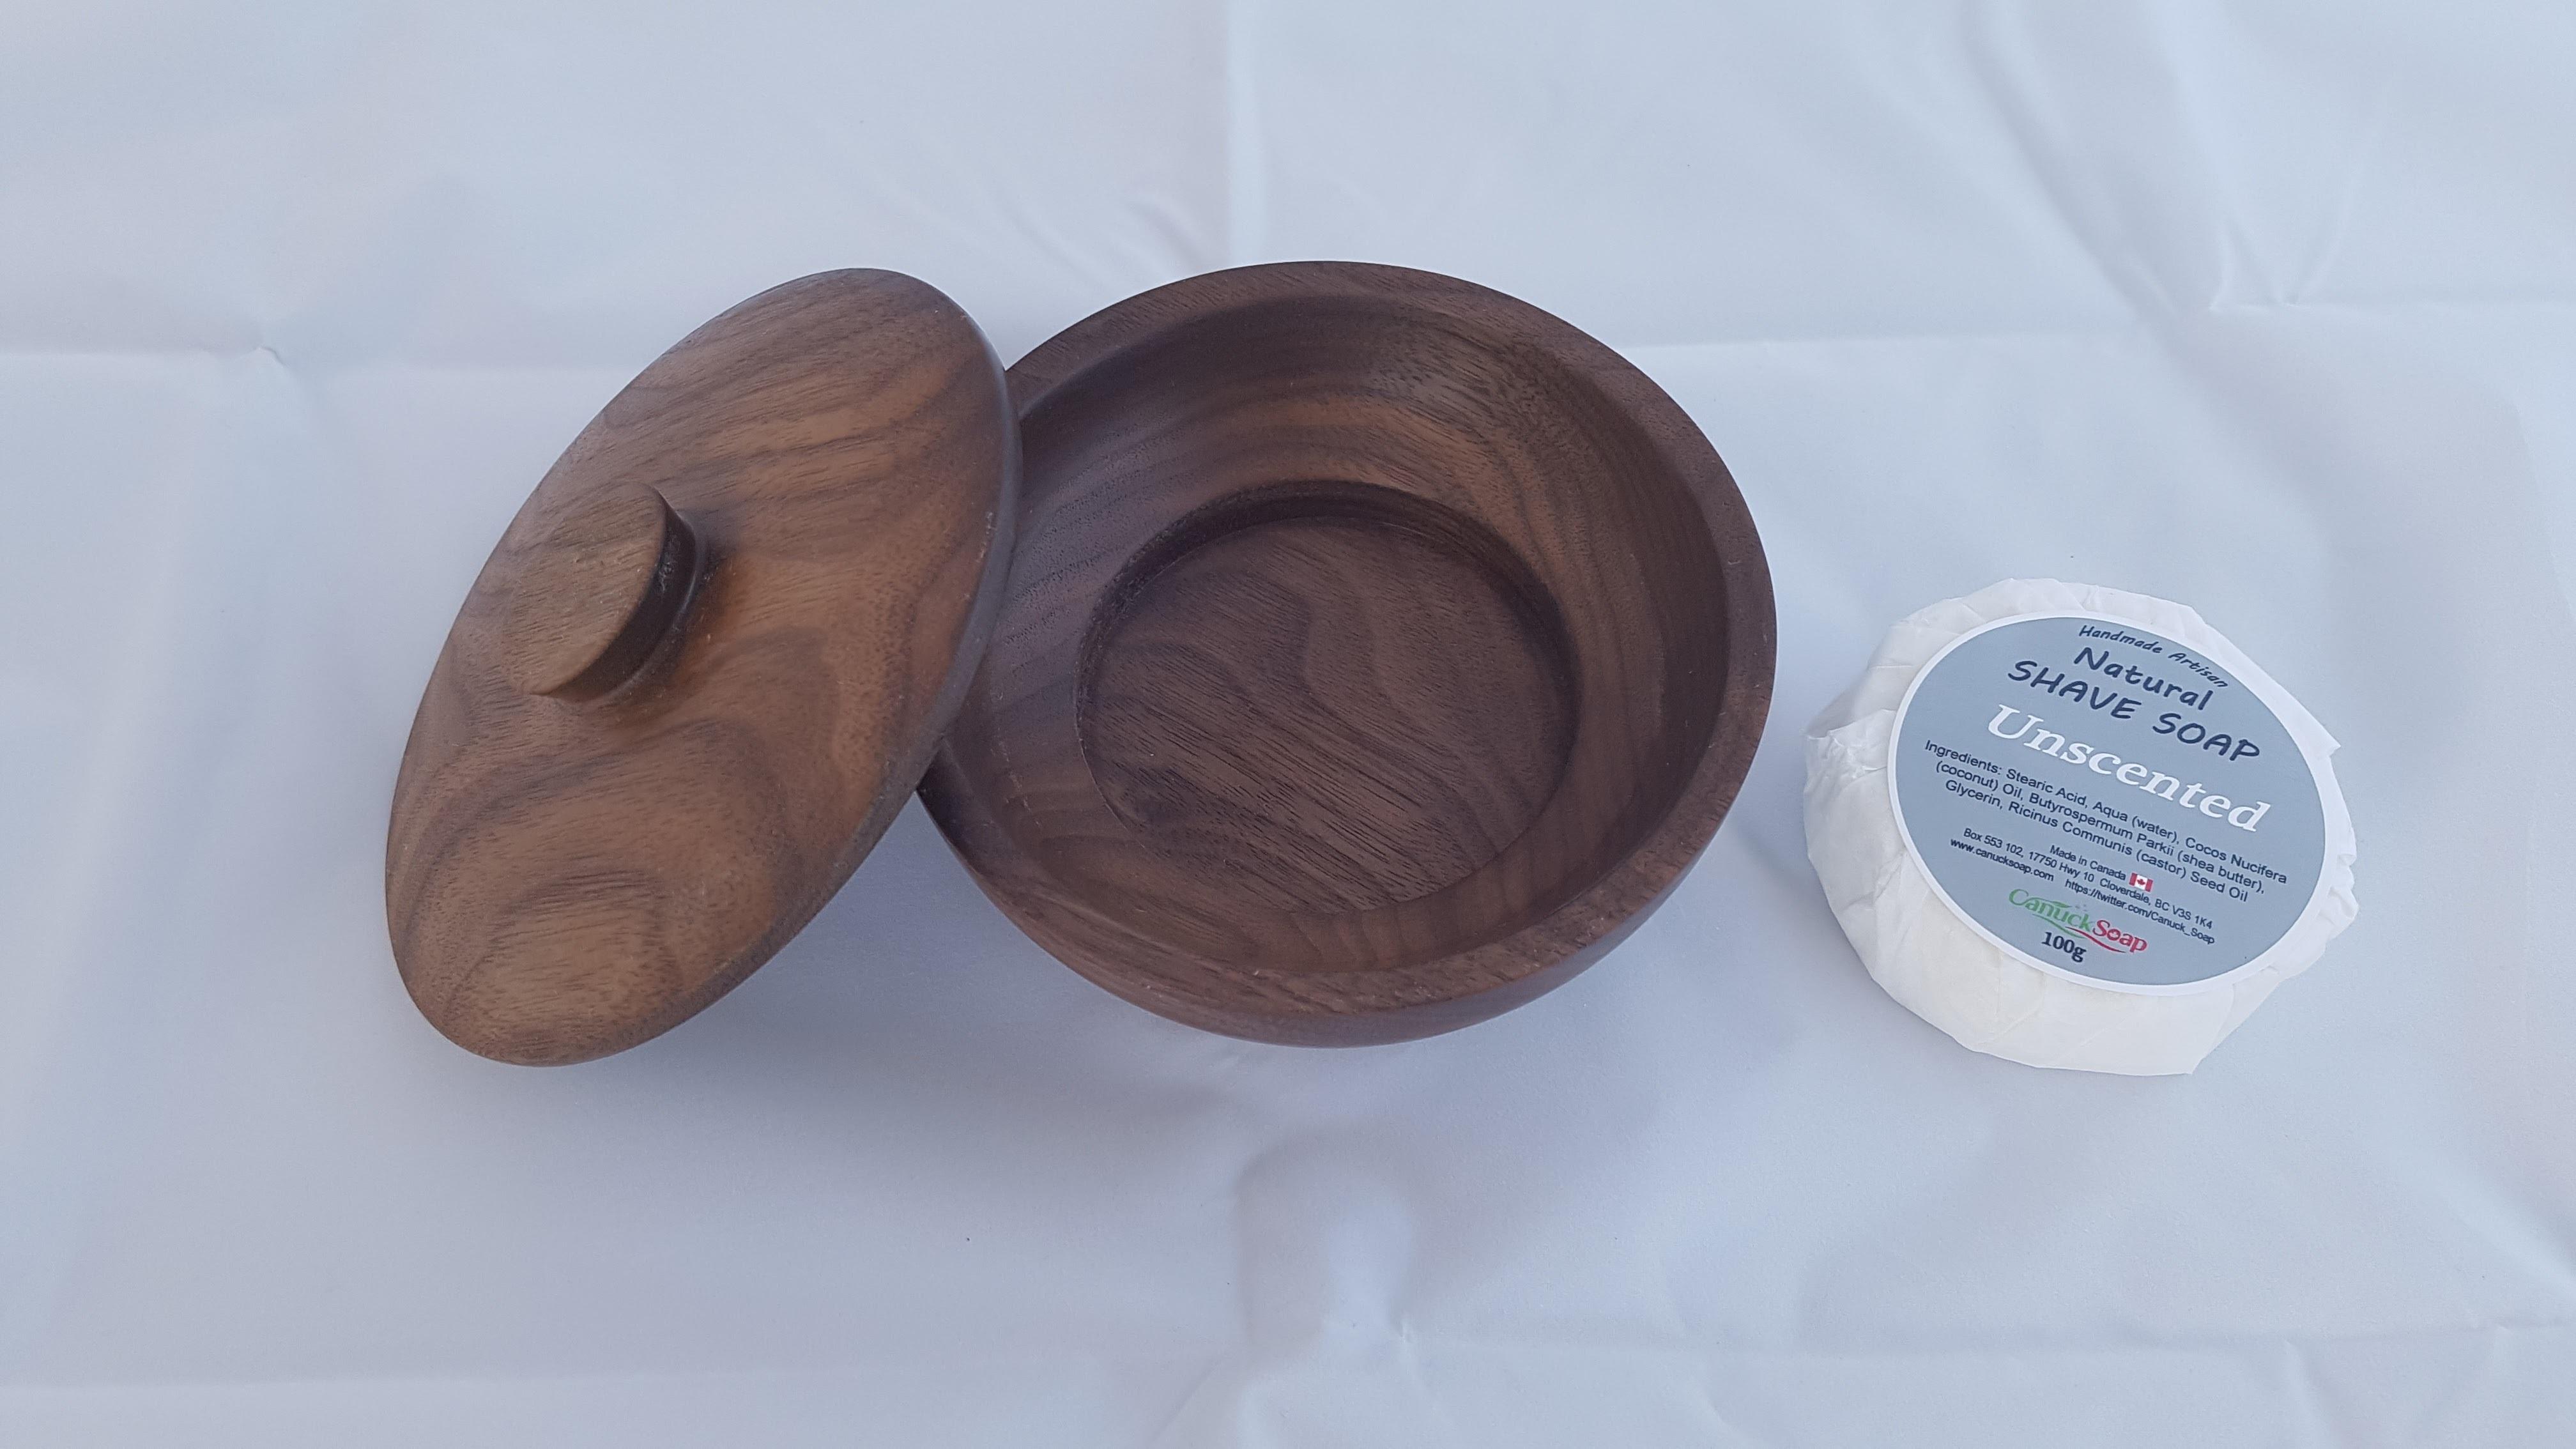 Walnut wood Shaving bowl